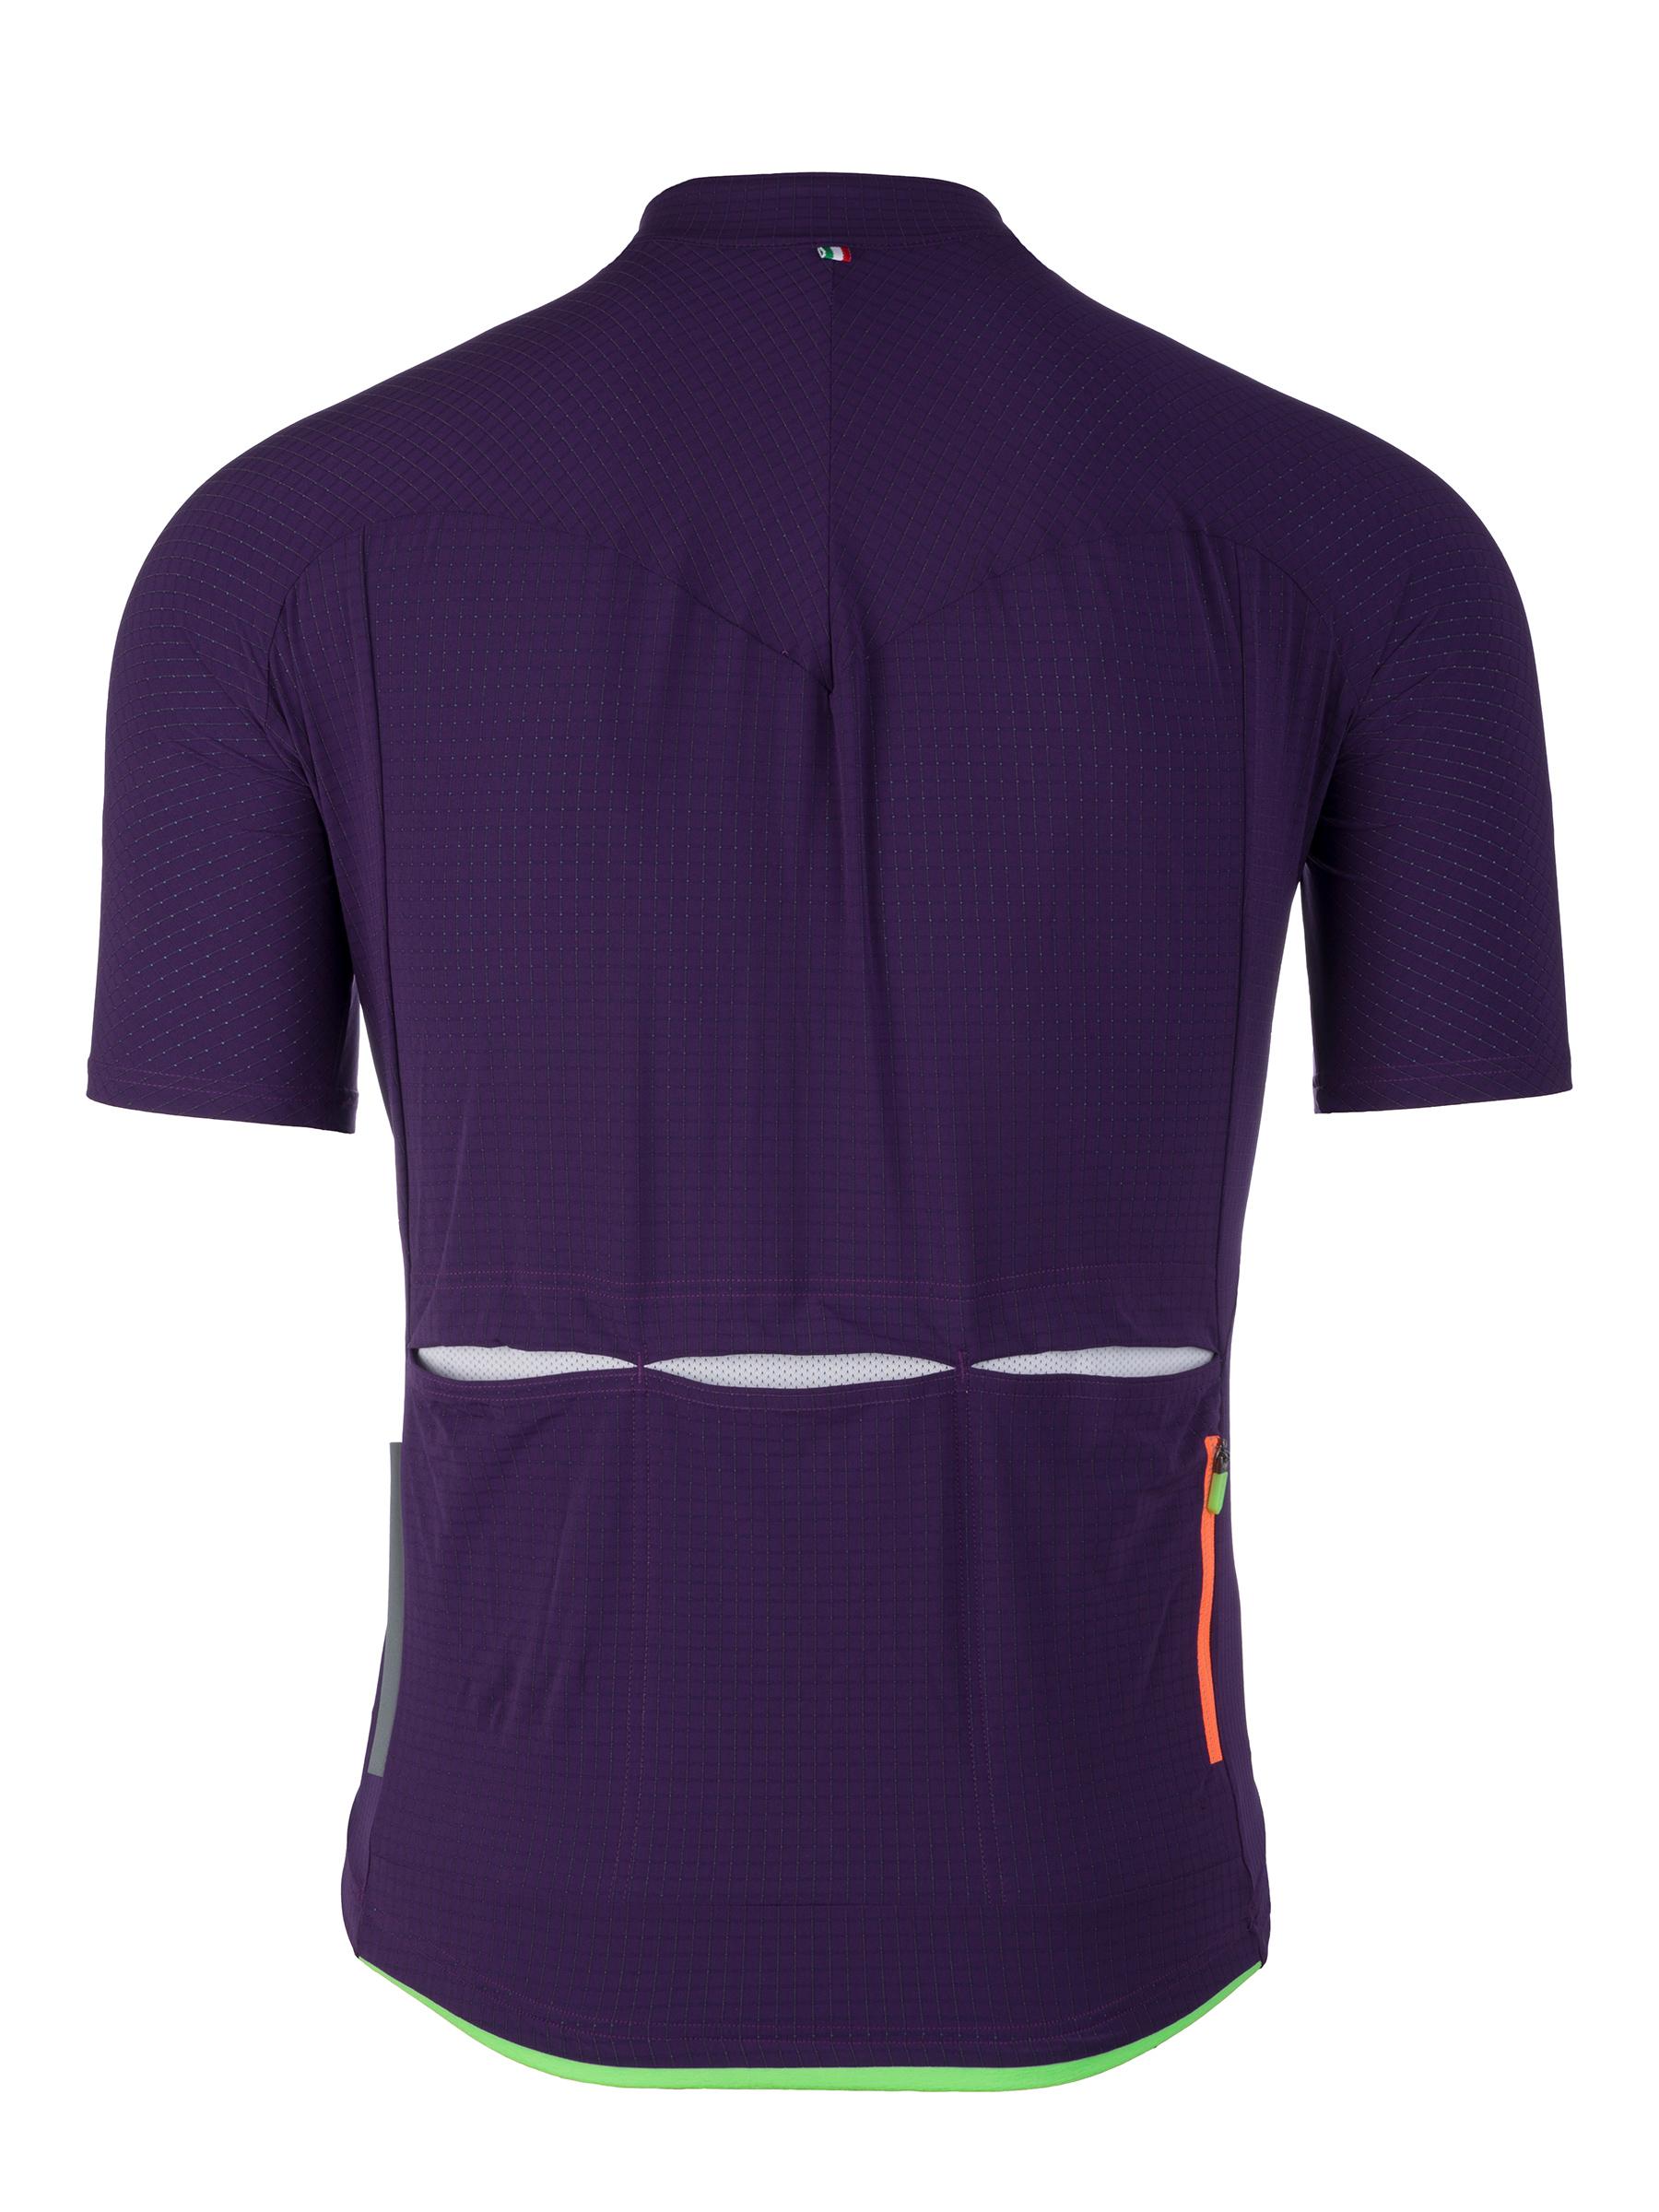 Maillot Manches Courtes L1 Pinstripe Violet